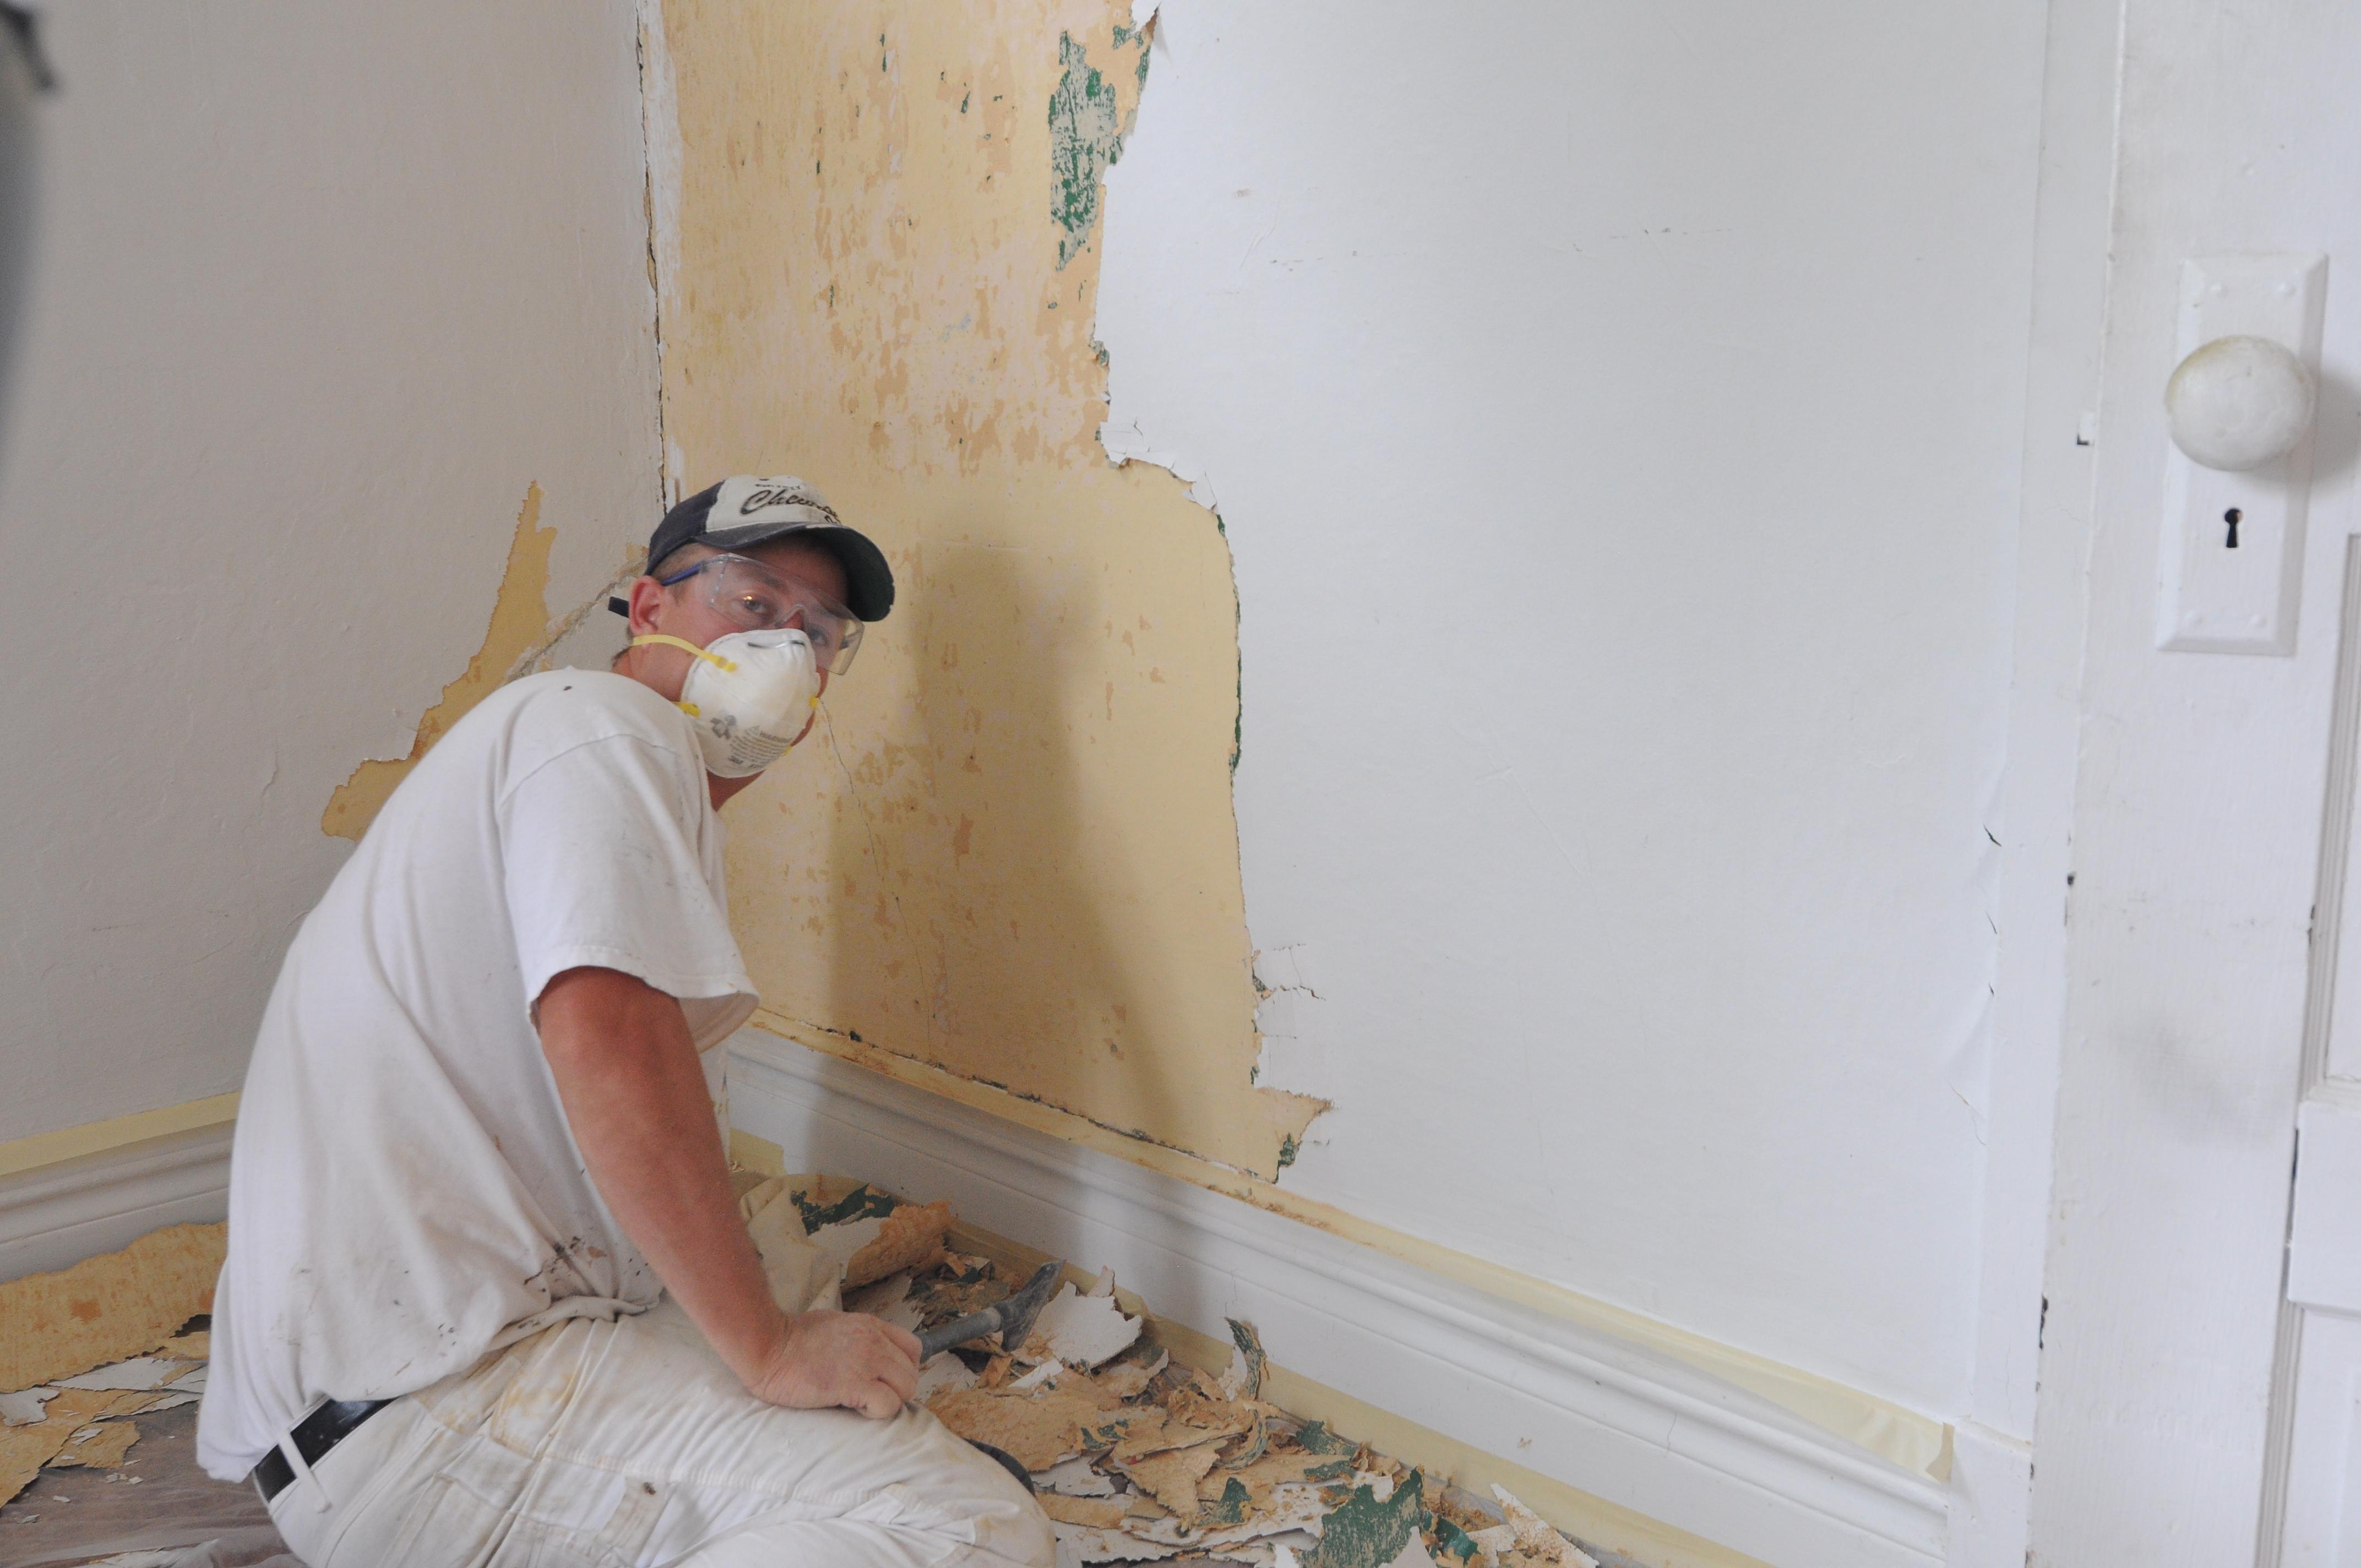 Removing Wallpaper And Repairing Walls DSC 1045 1039